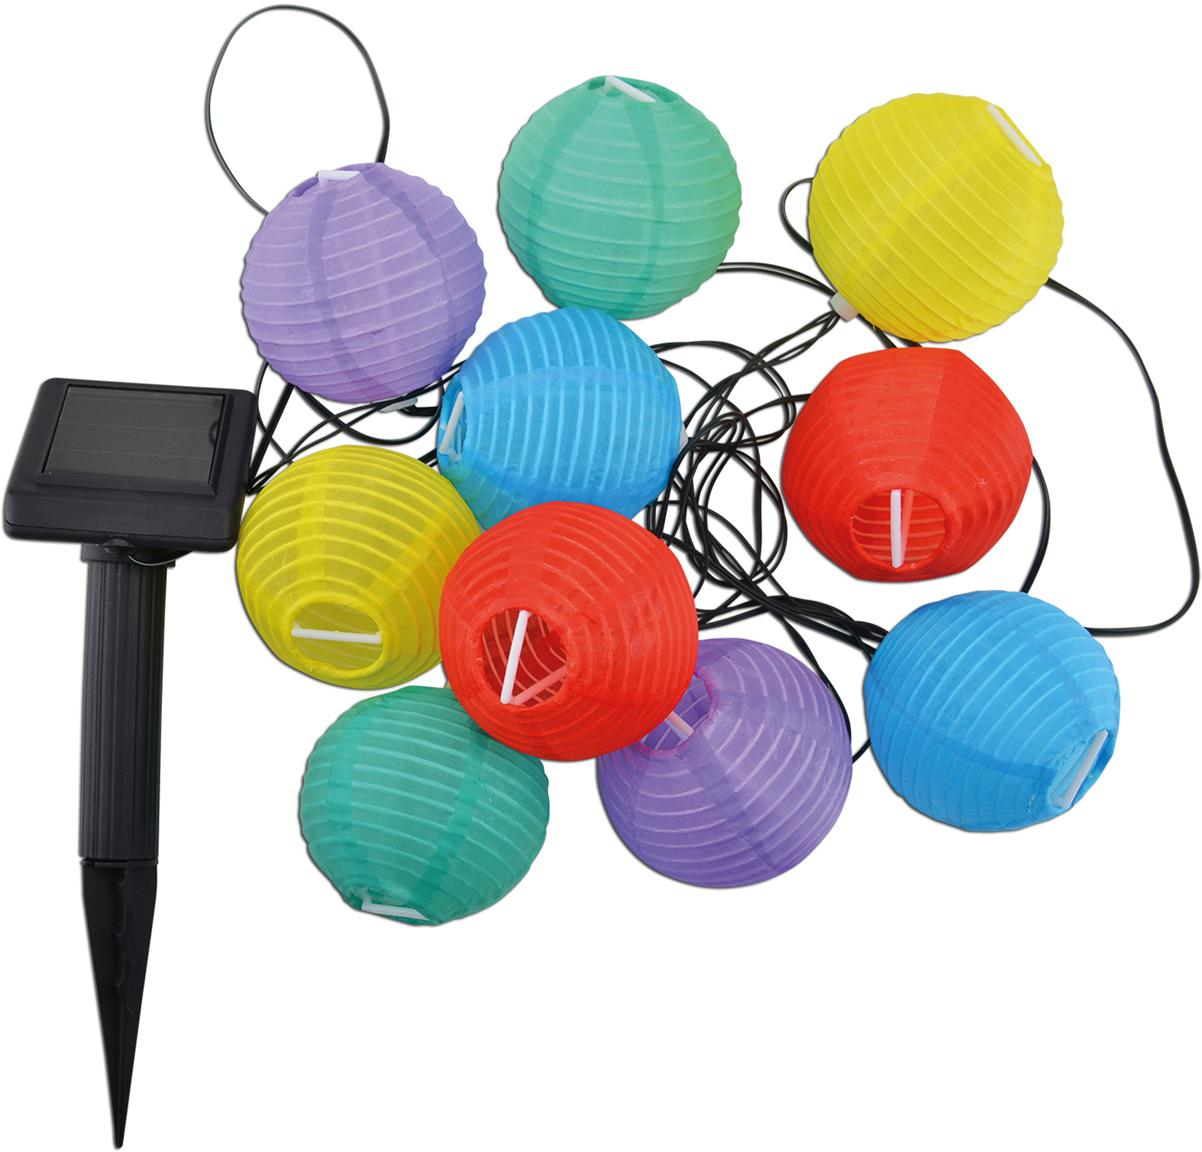 Ghirlanda a LED Lampion, Materiale sintetico, Multicolore, Lung. 380 cm